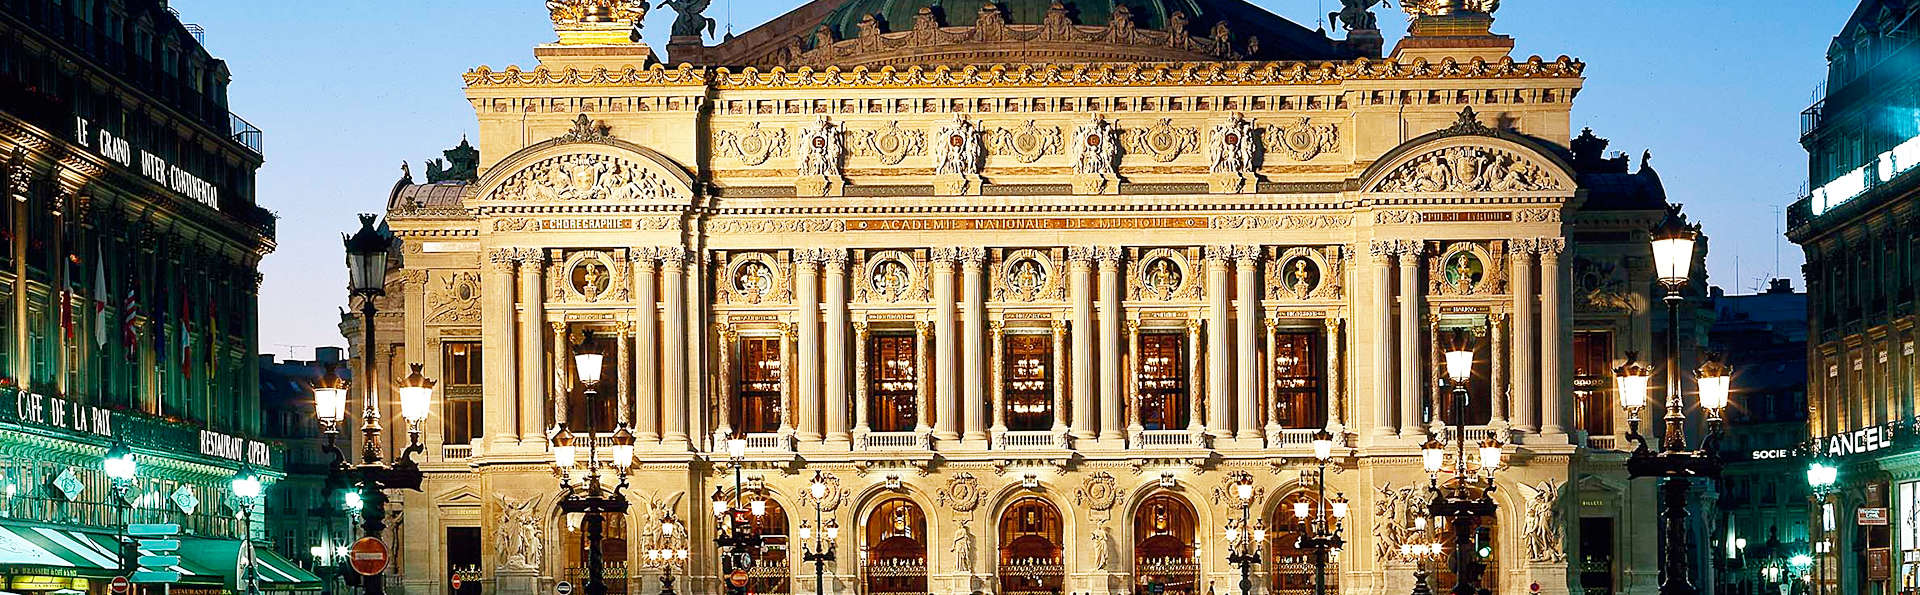 Hôtel Opera Vivaldi - EDIT_destination1.jpg